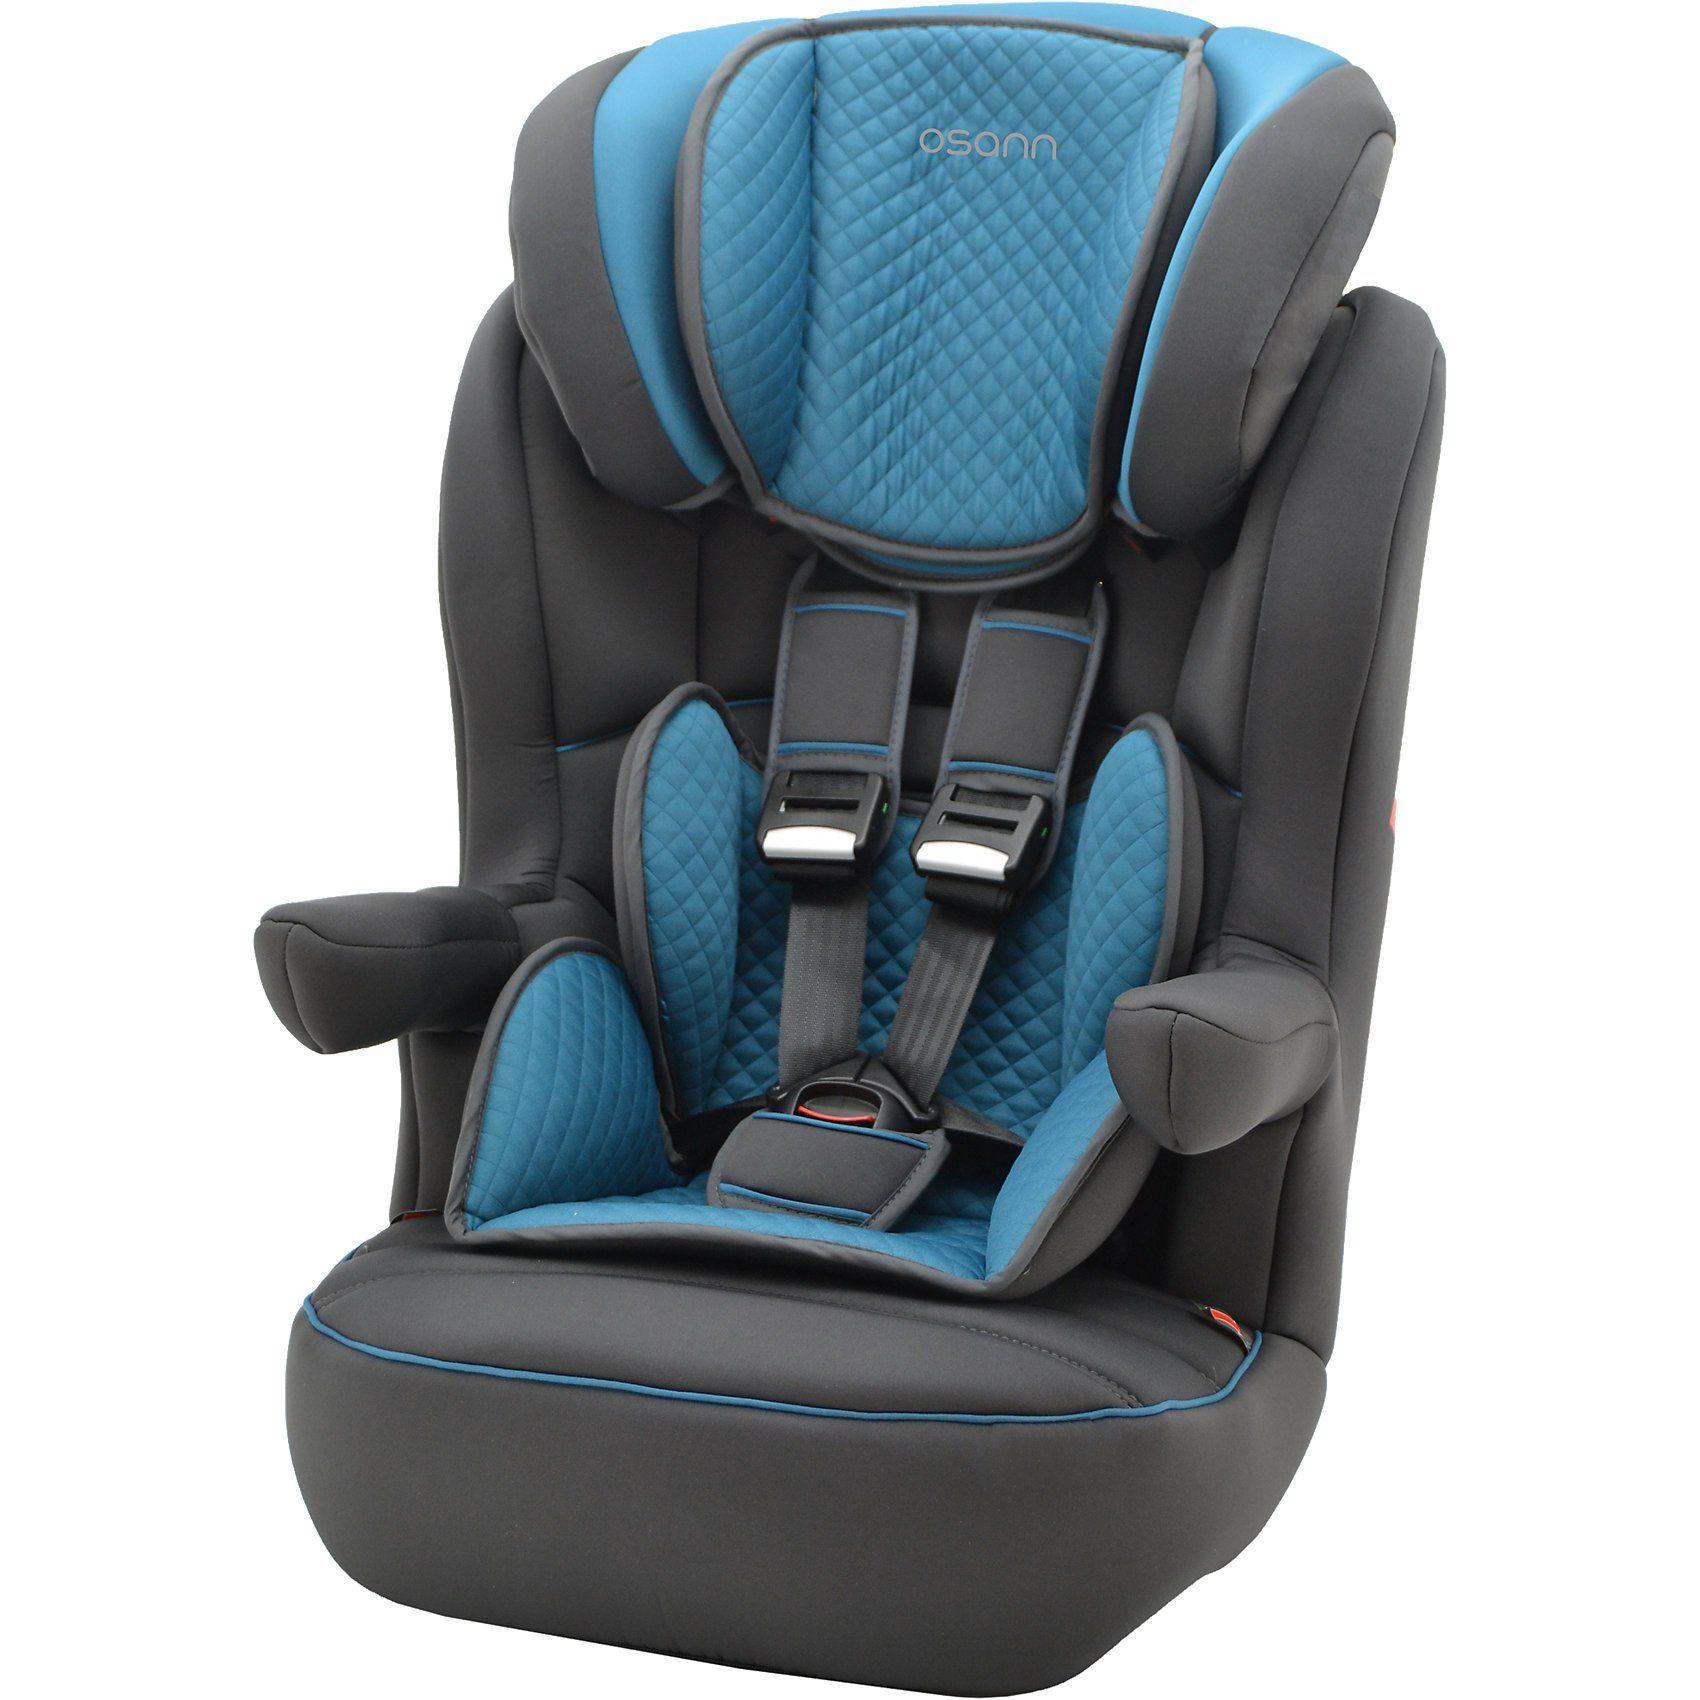 Osann Auto-Kindersitz Comet, Quilt Petrol, 2017